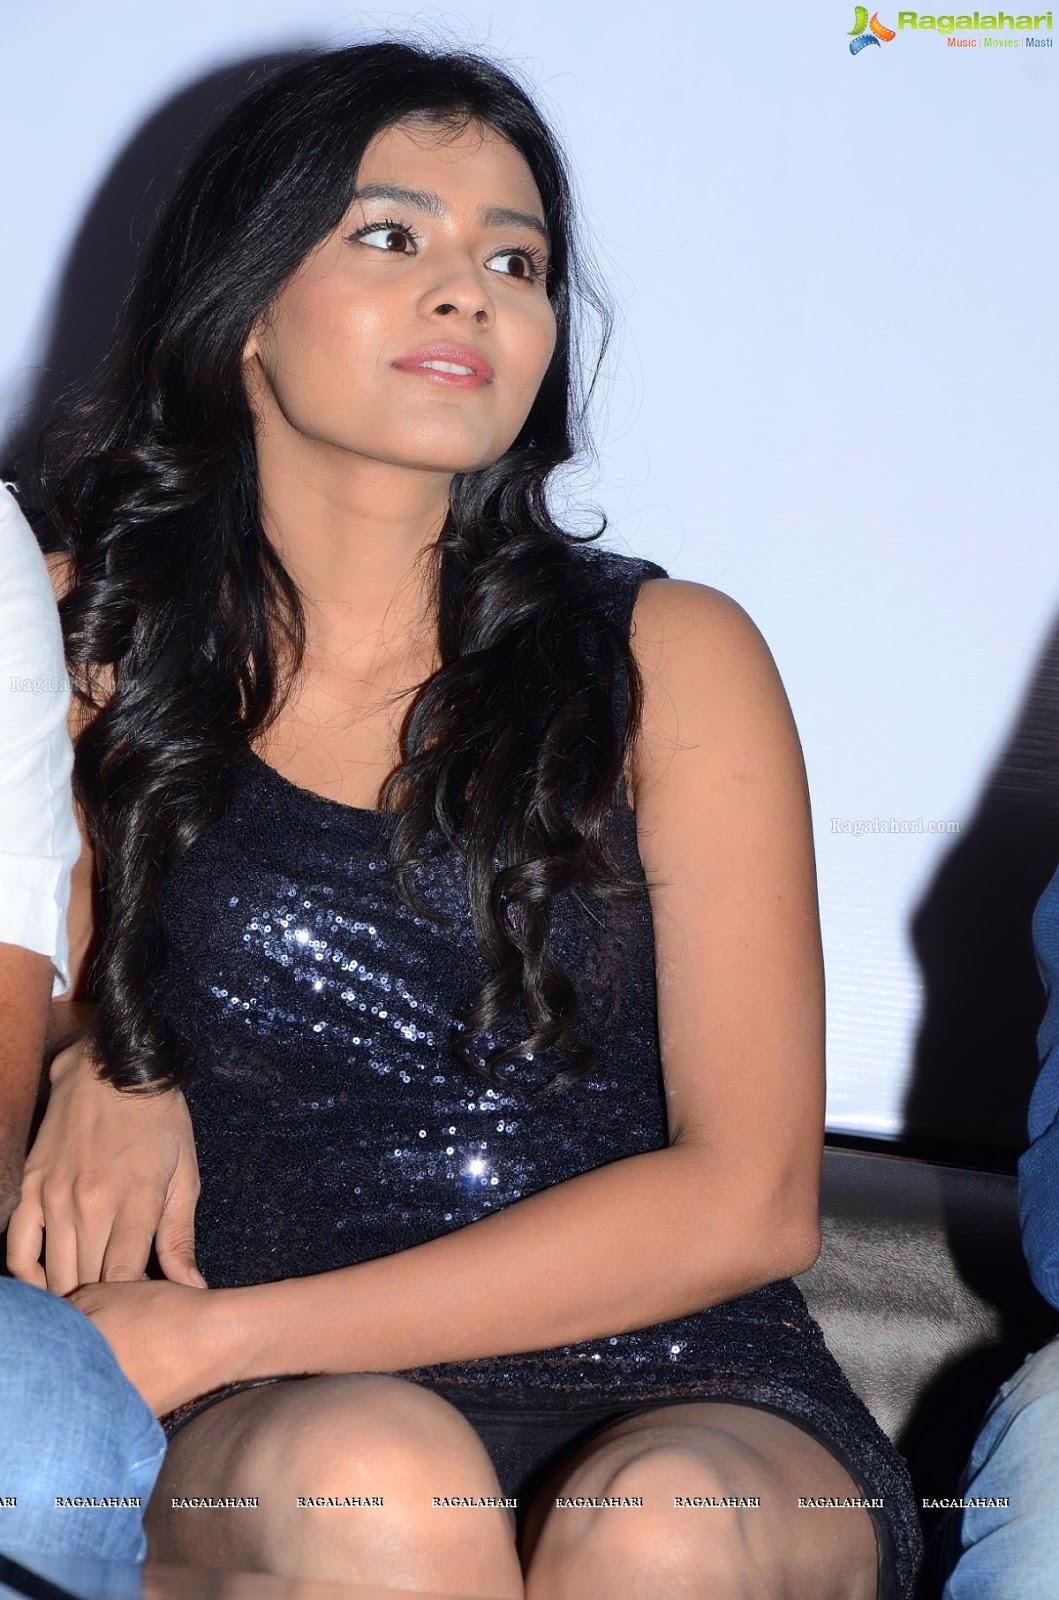 hebah patel hot and beautiful images   serial actress hot